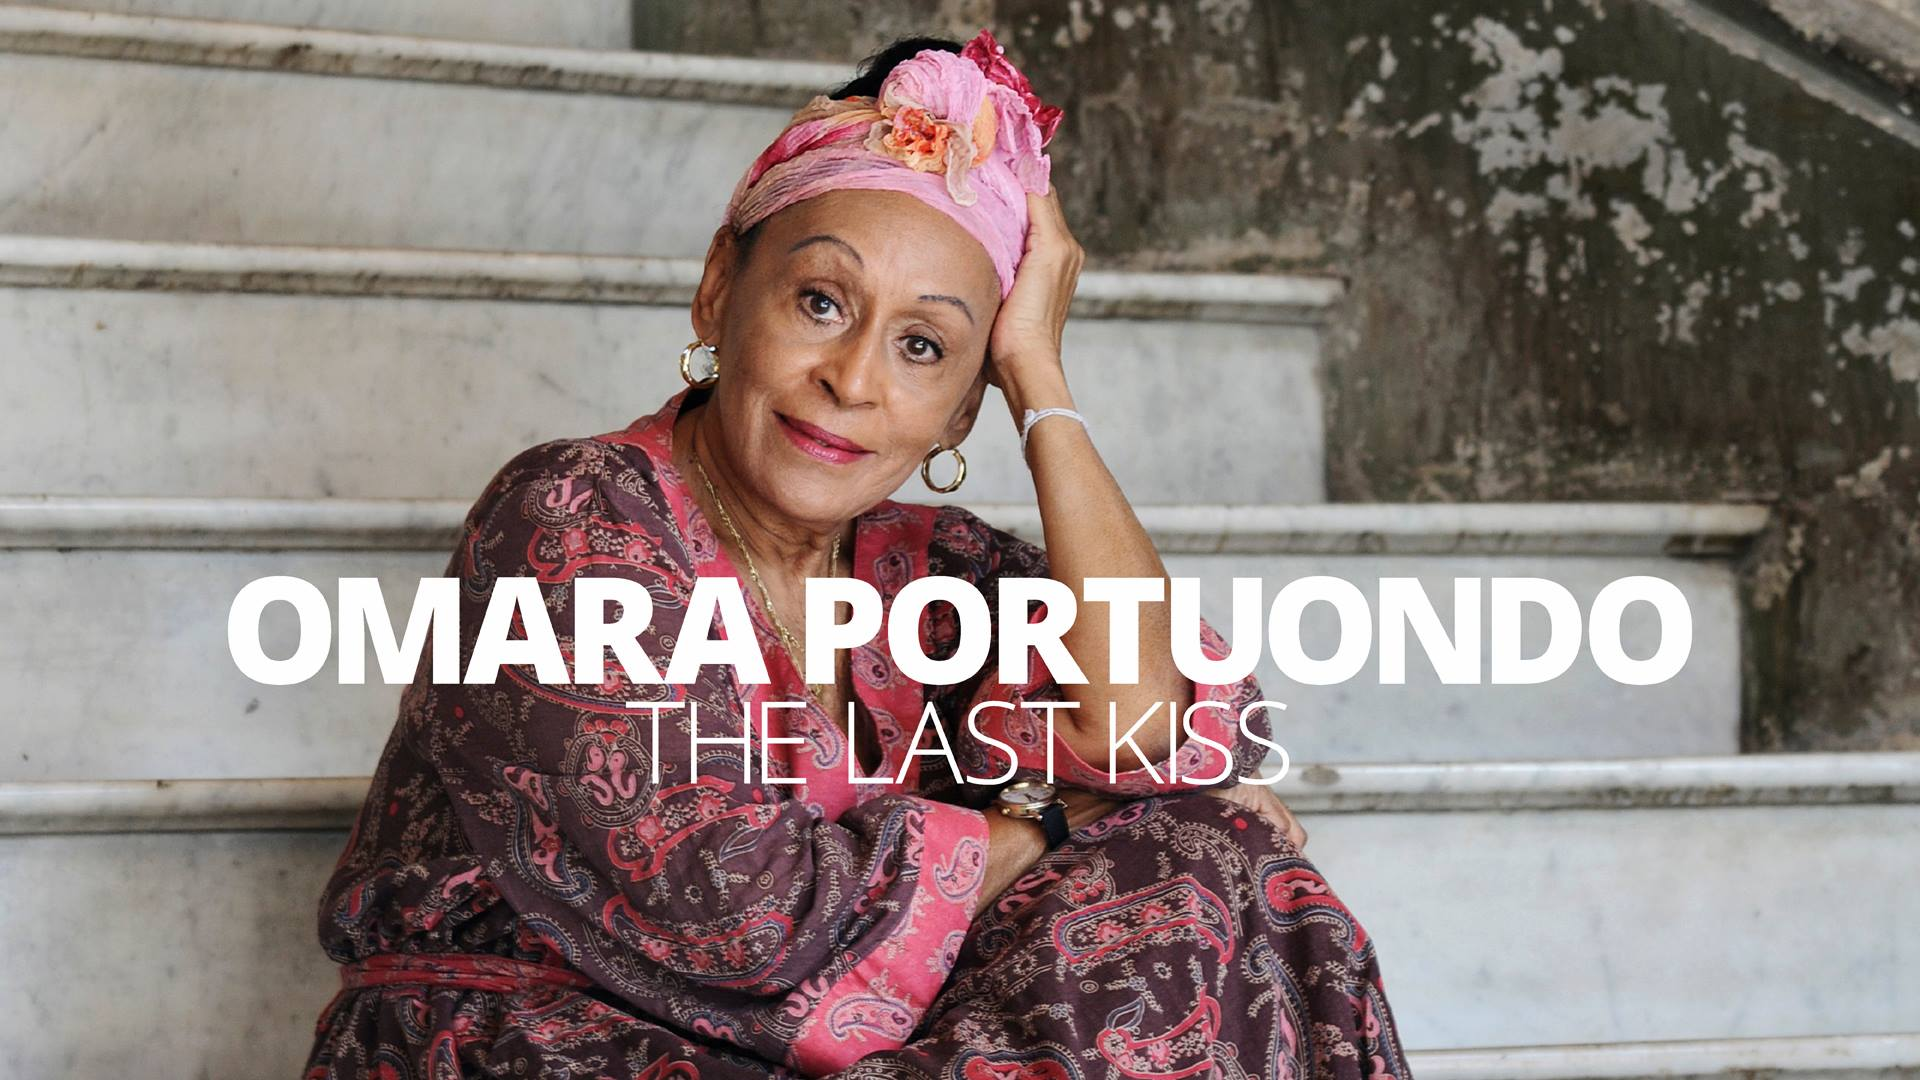 Omara Portuondo koncert 2019